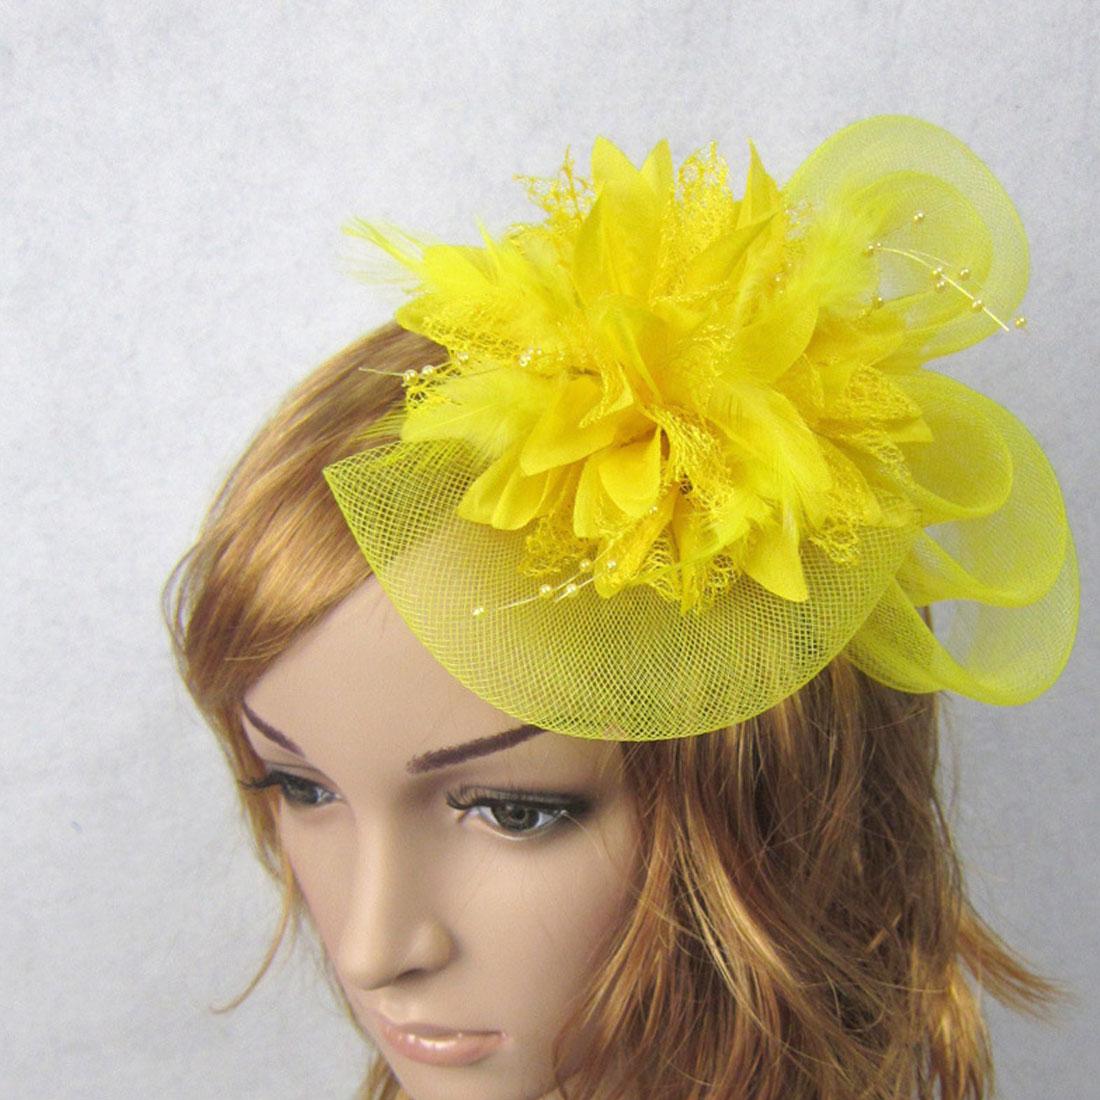 Women Chic Fascinator Hat Cocktail Wedding Party Church Headpiece   Headwear   Fancy Feather Hair Accessories Hair Accessories